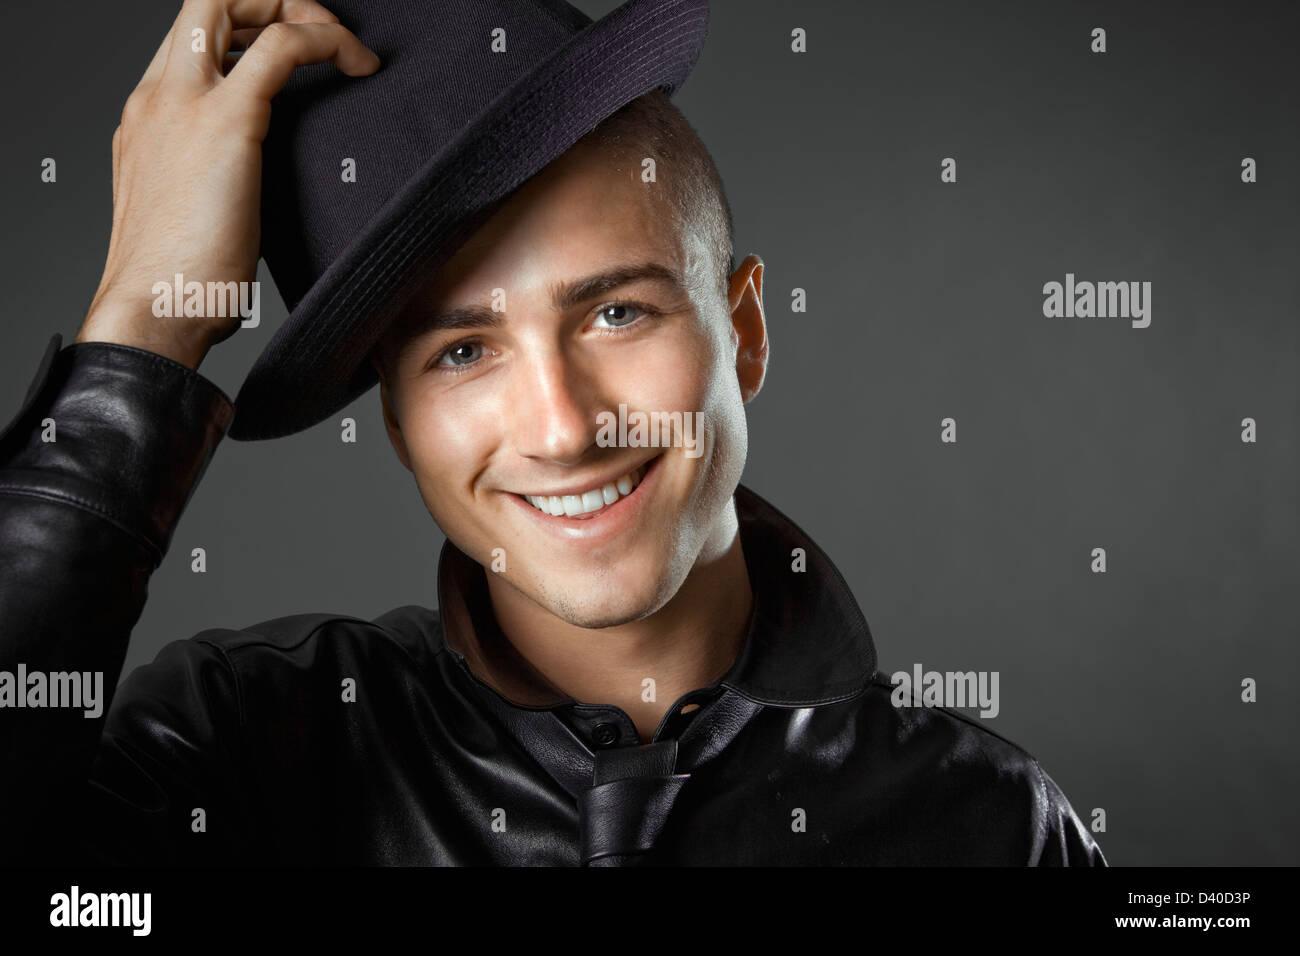 Young caucasian man in men's fashion photo taken in studio - Stock Image